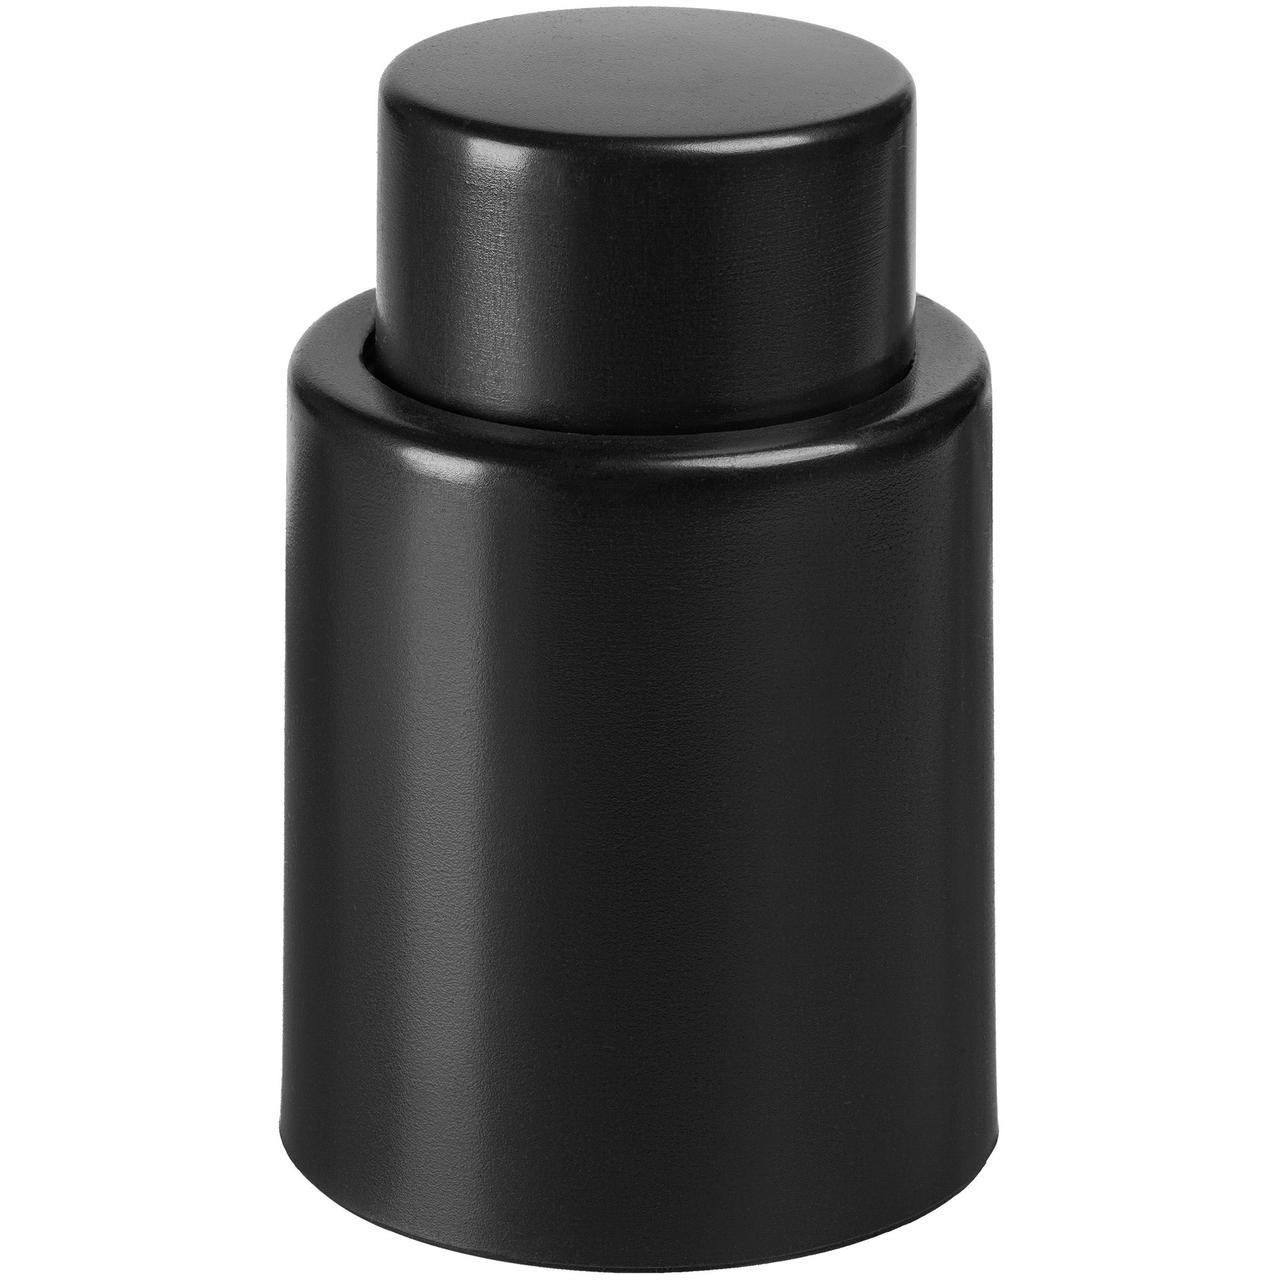 Пробка для бутылки Wine Keeper, вакуумная, черная (артикул 10367.30)